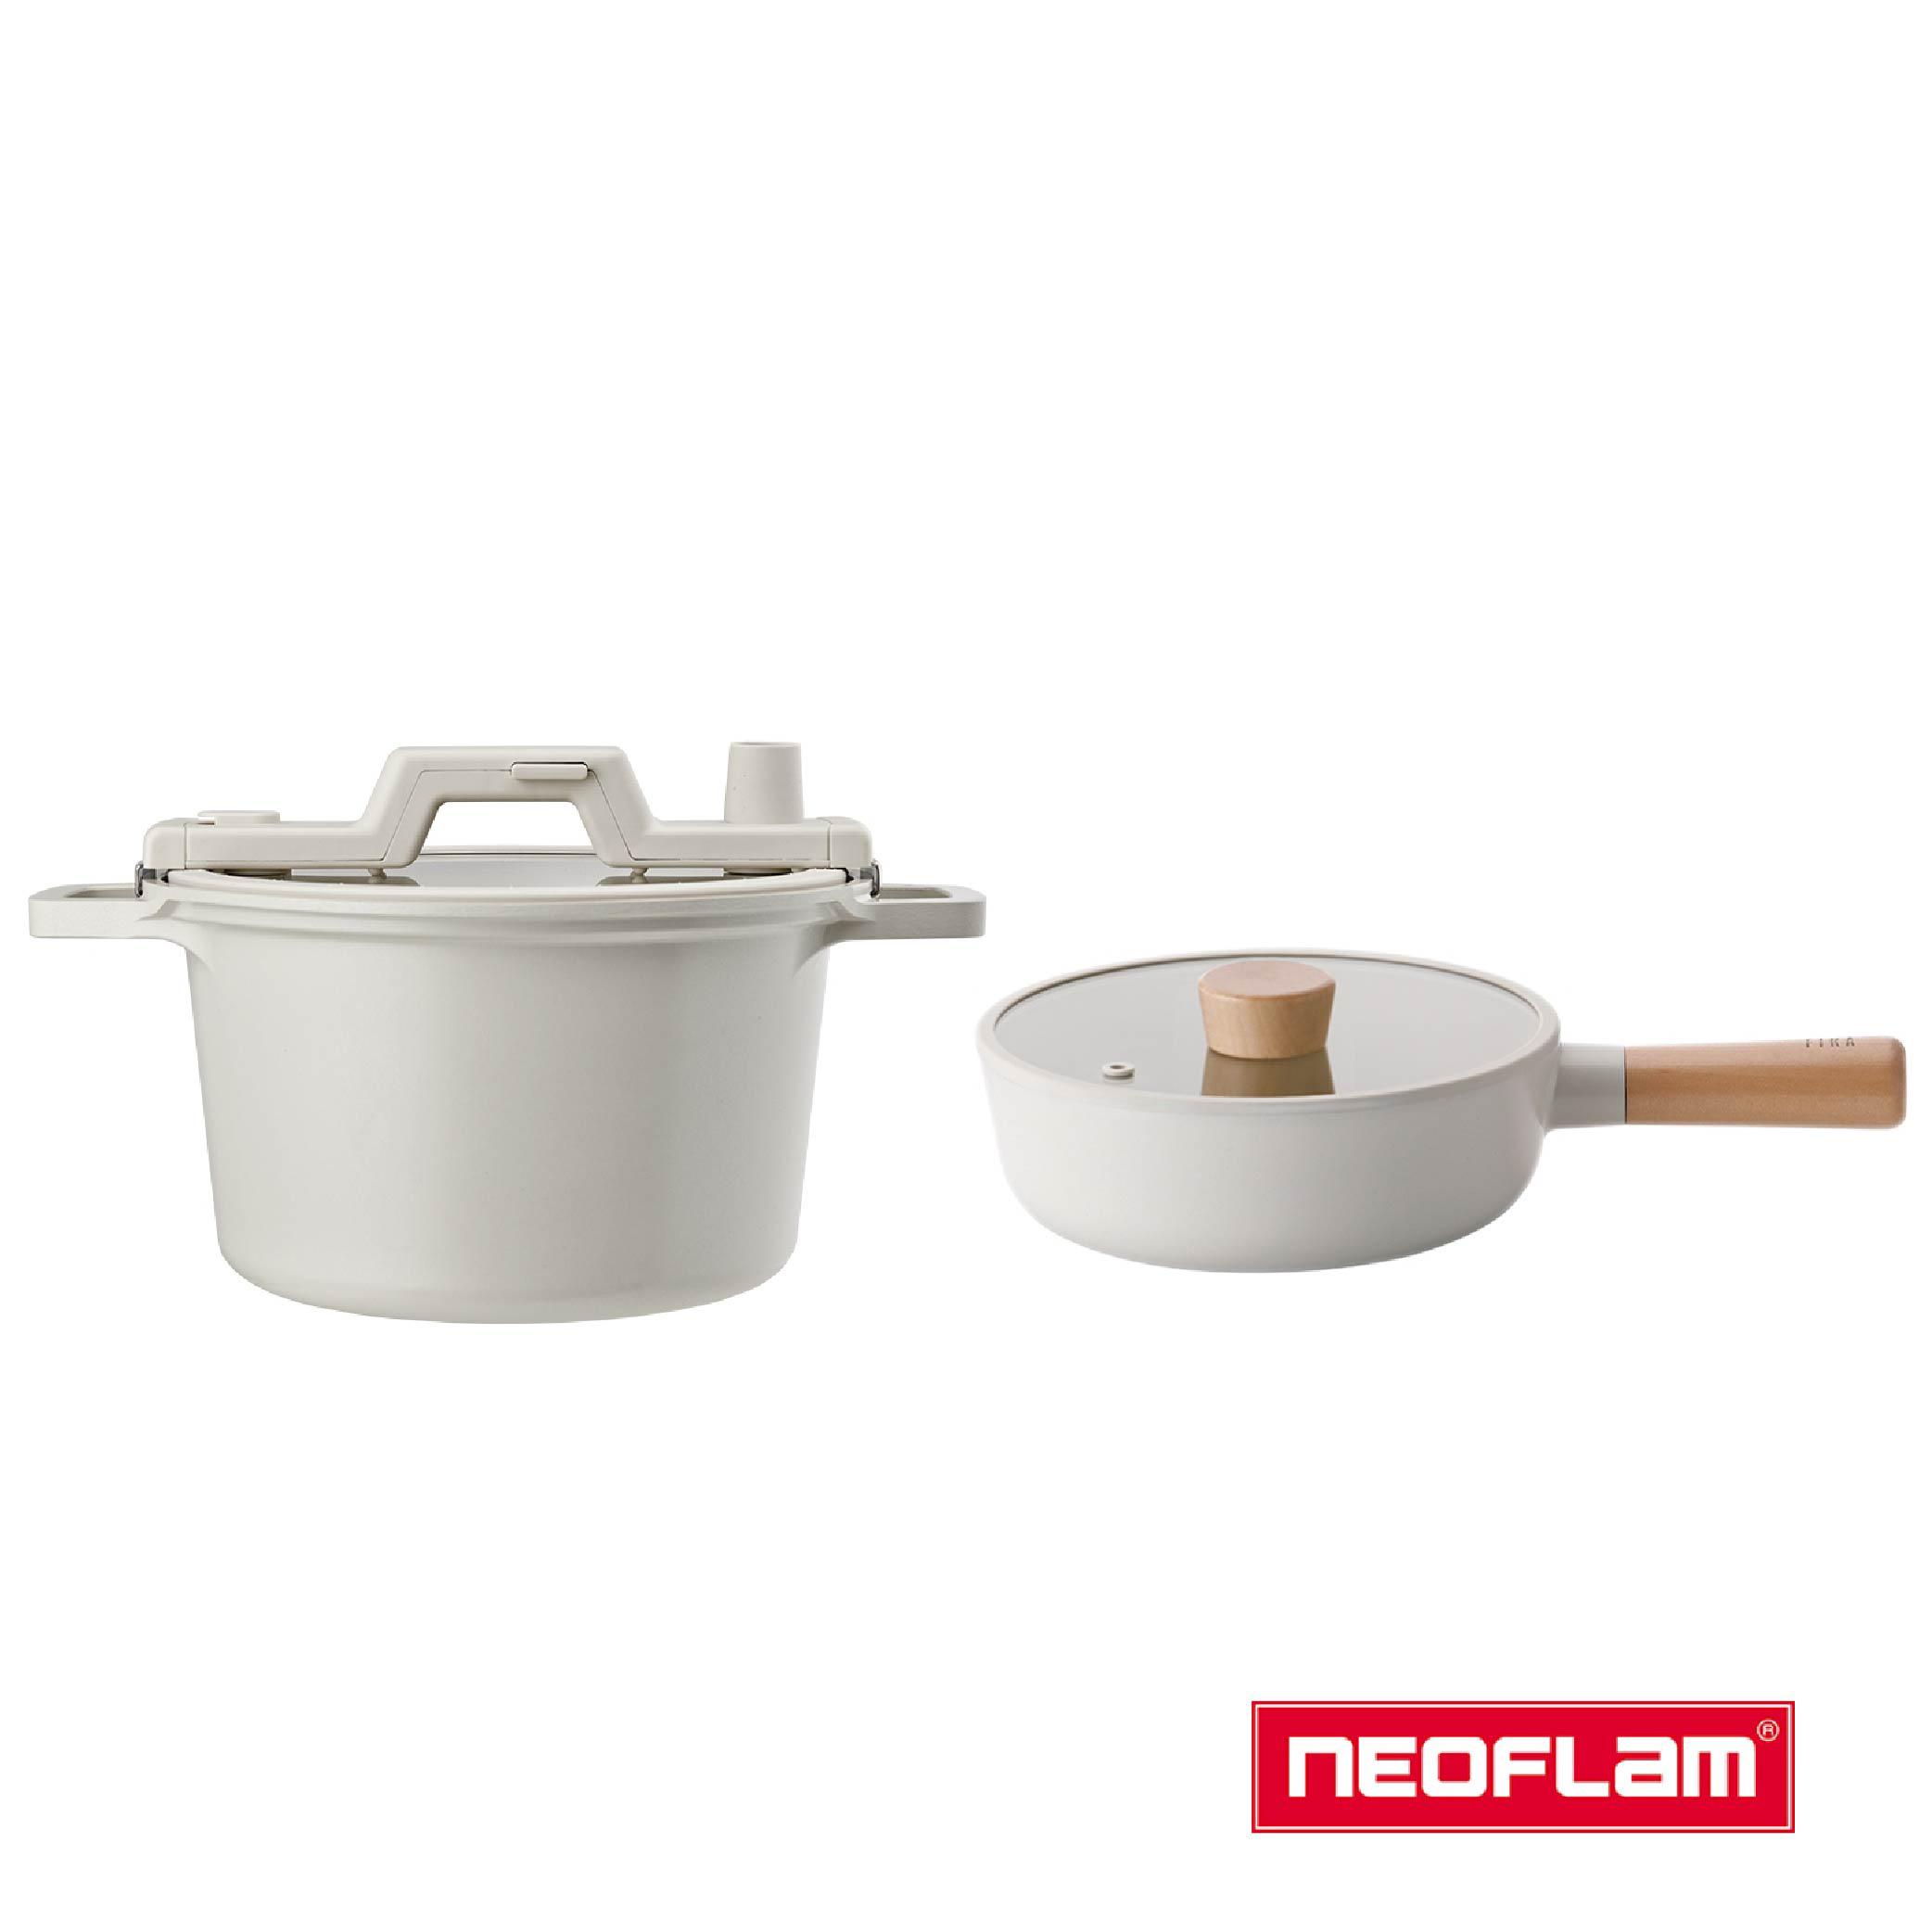 【NEOFLAM】FIKA Smart Cook 2入組